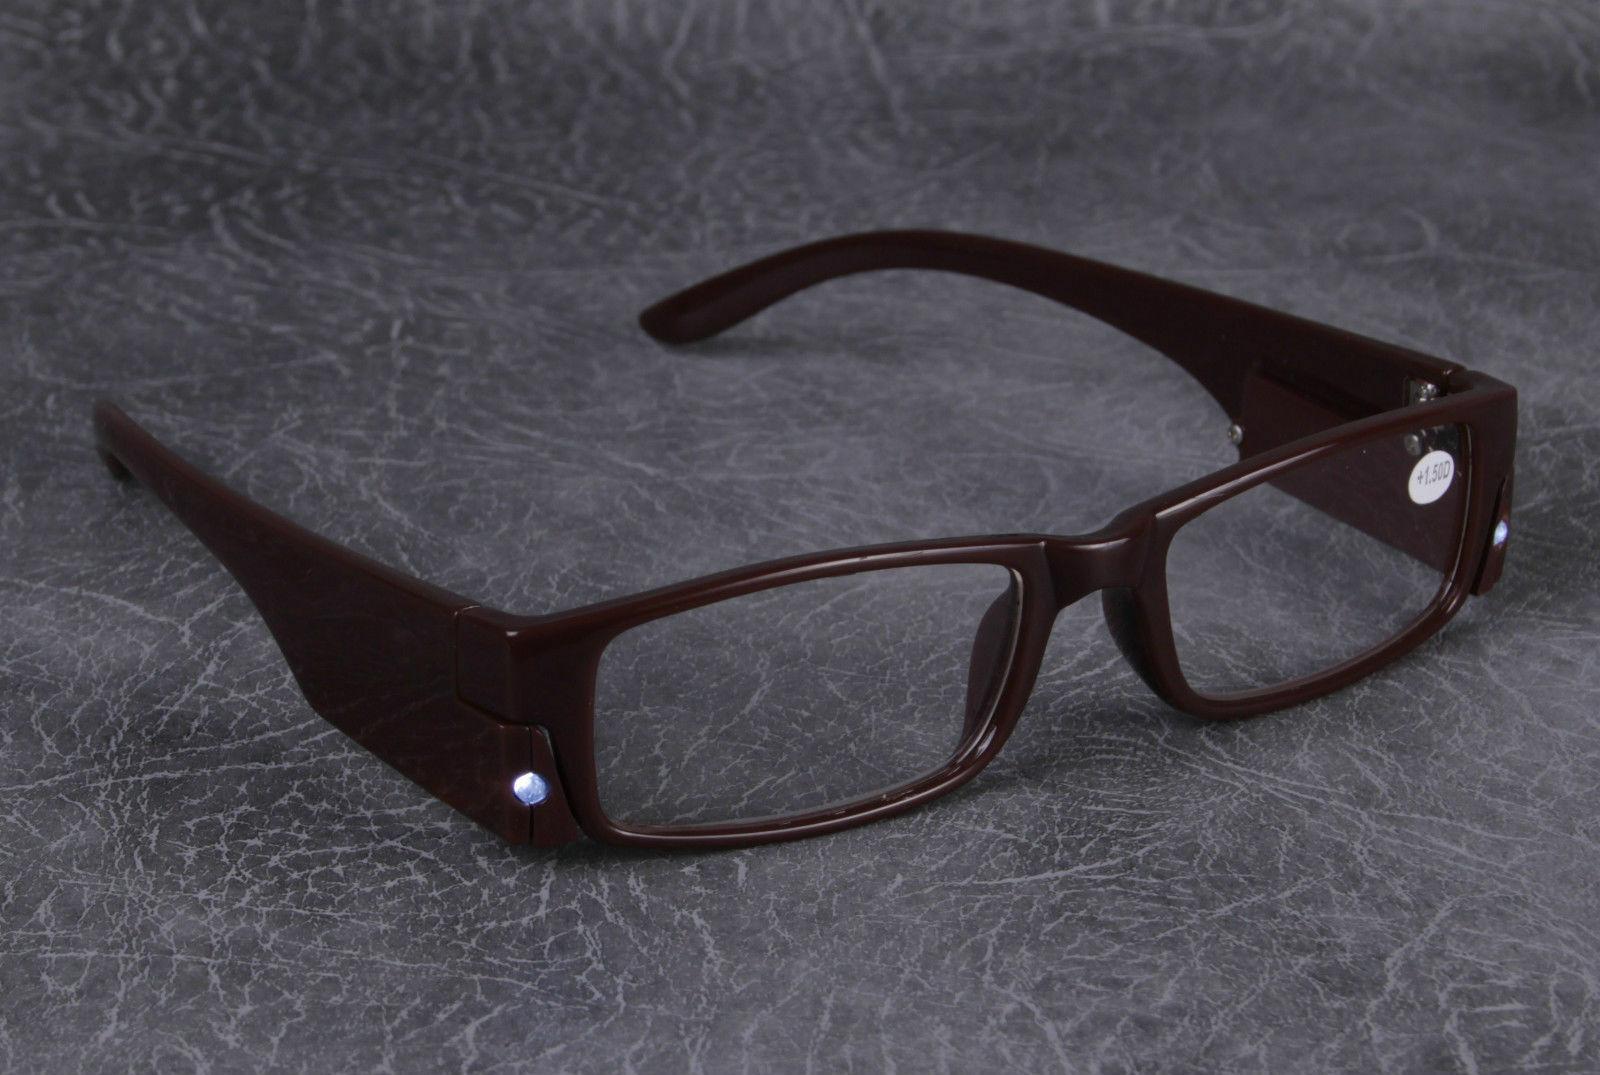 LED Reading Glasses Light Up Plastic Frame Magnifier ...